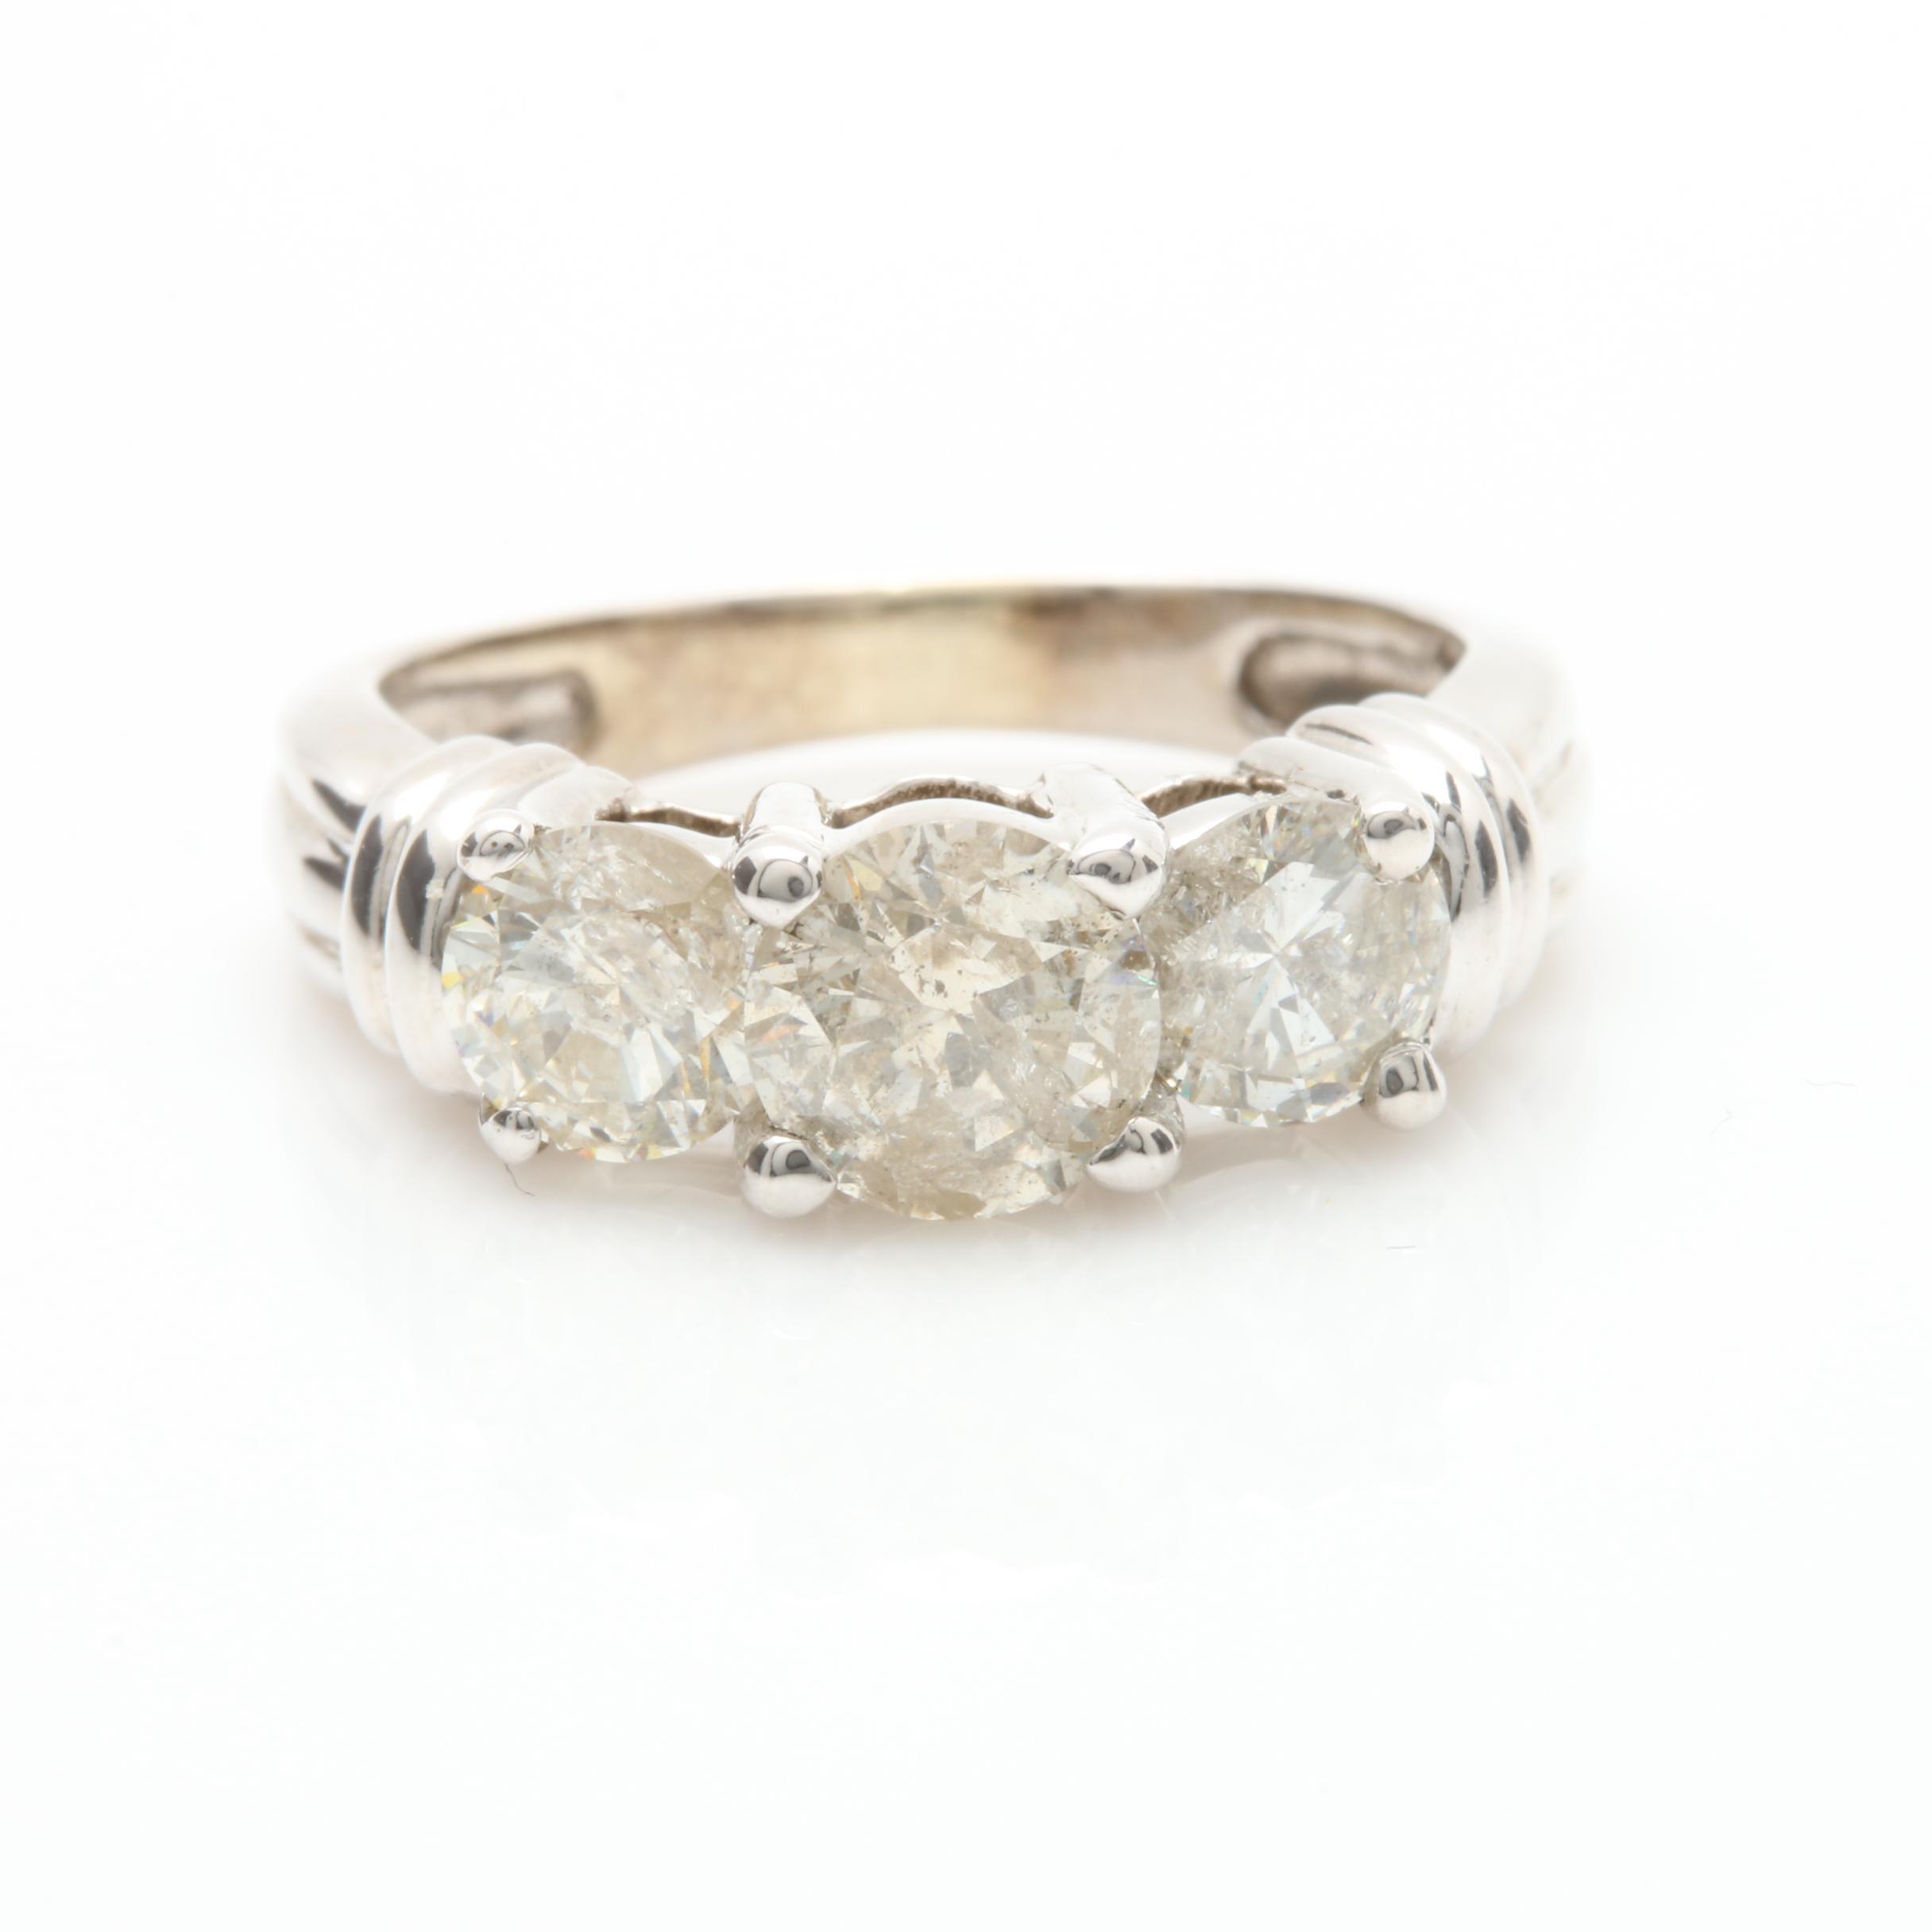 14K White Gold 1.45 CTW Diamond Ring